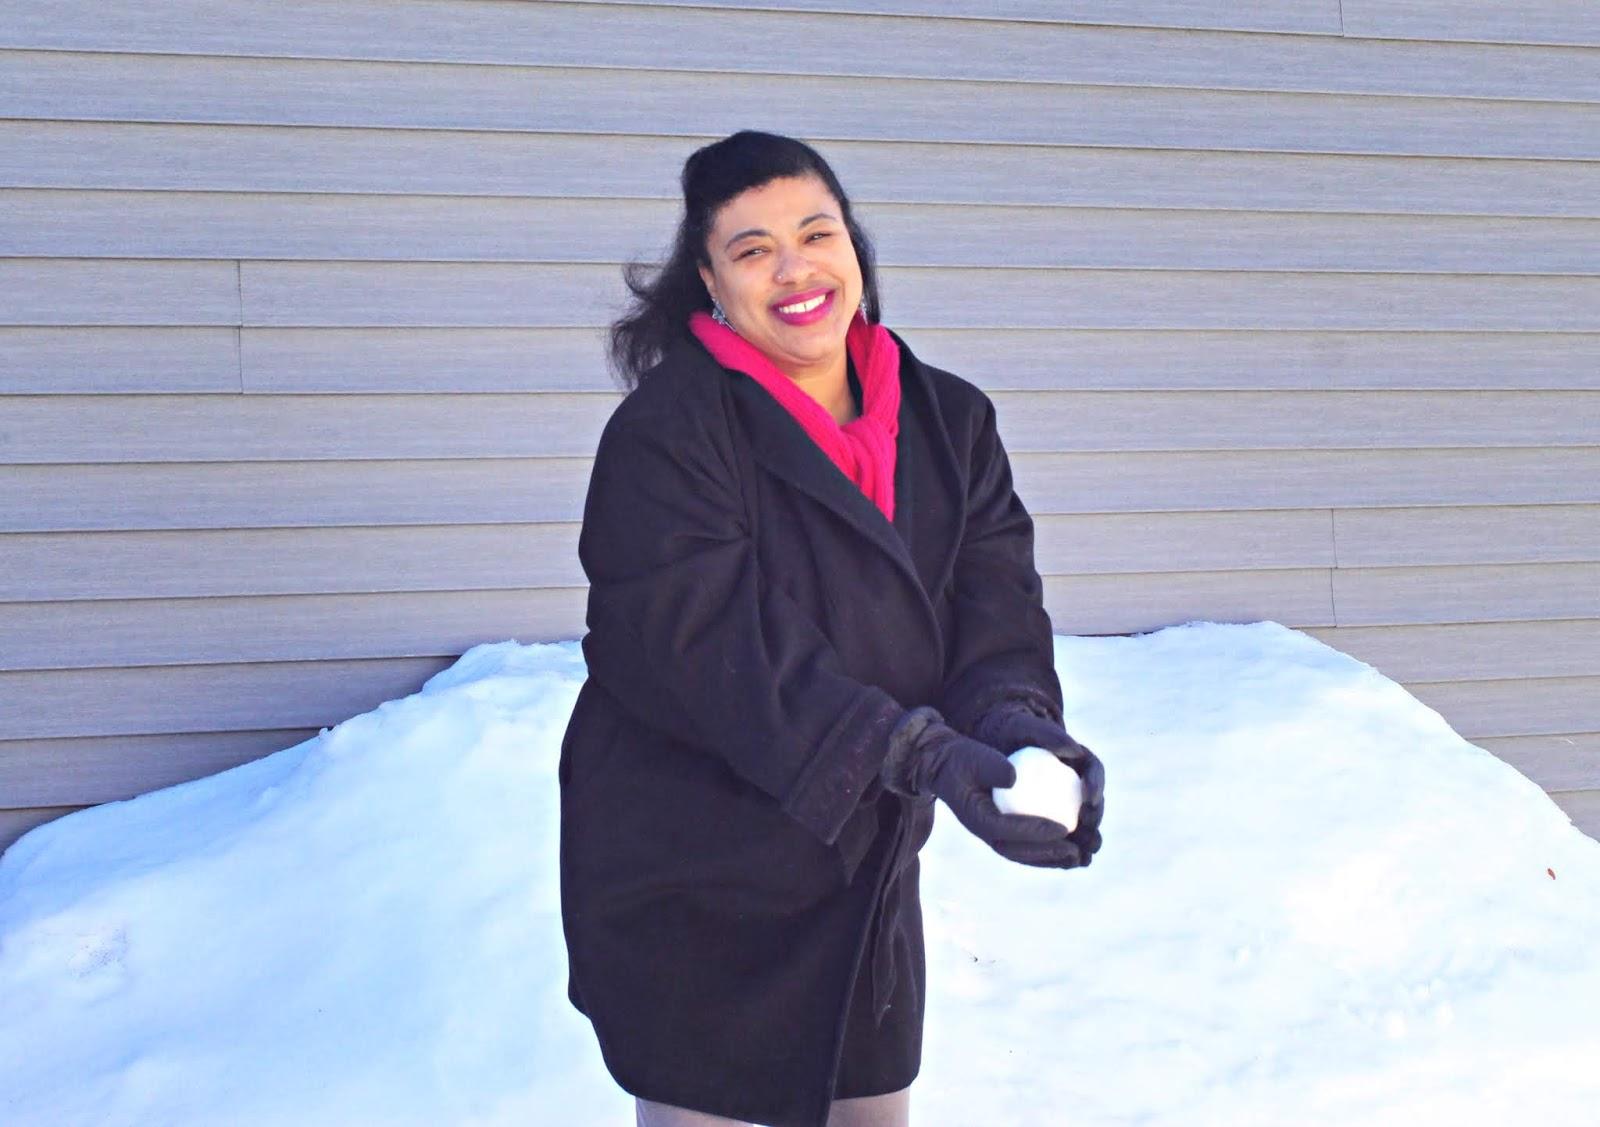 a black woman making a snowball